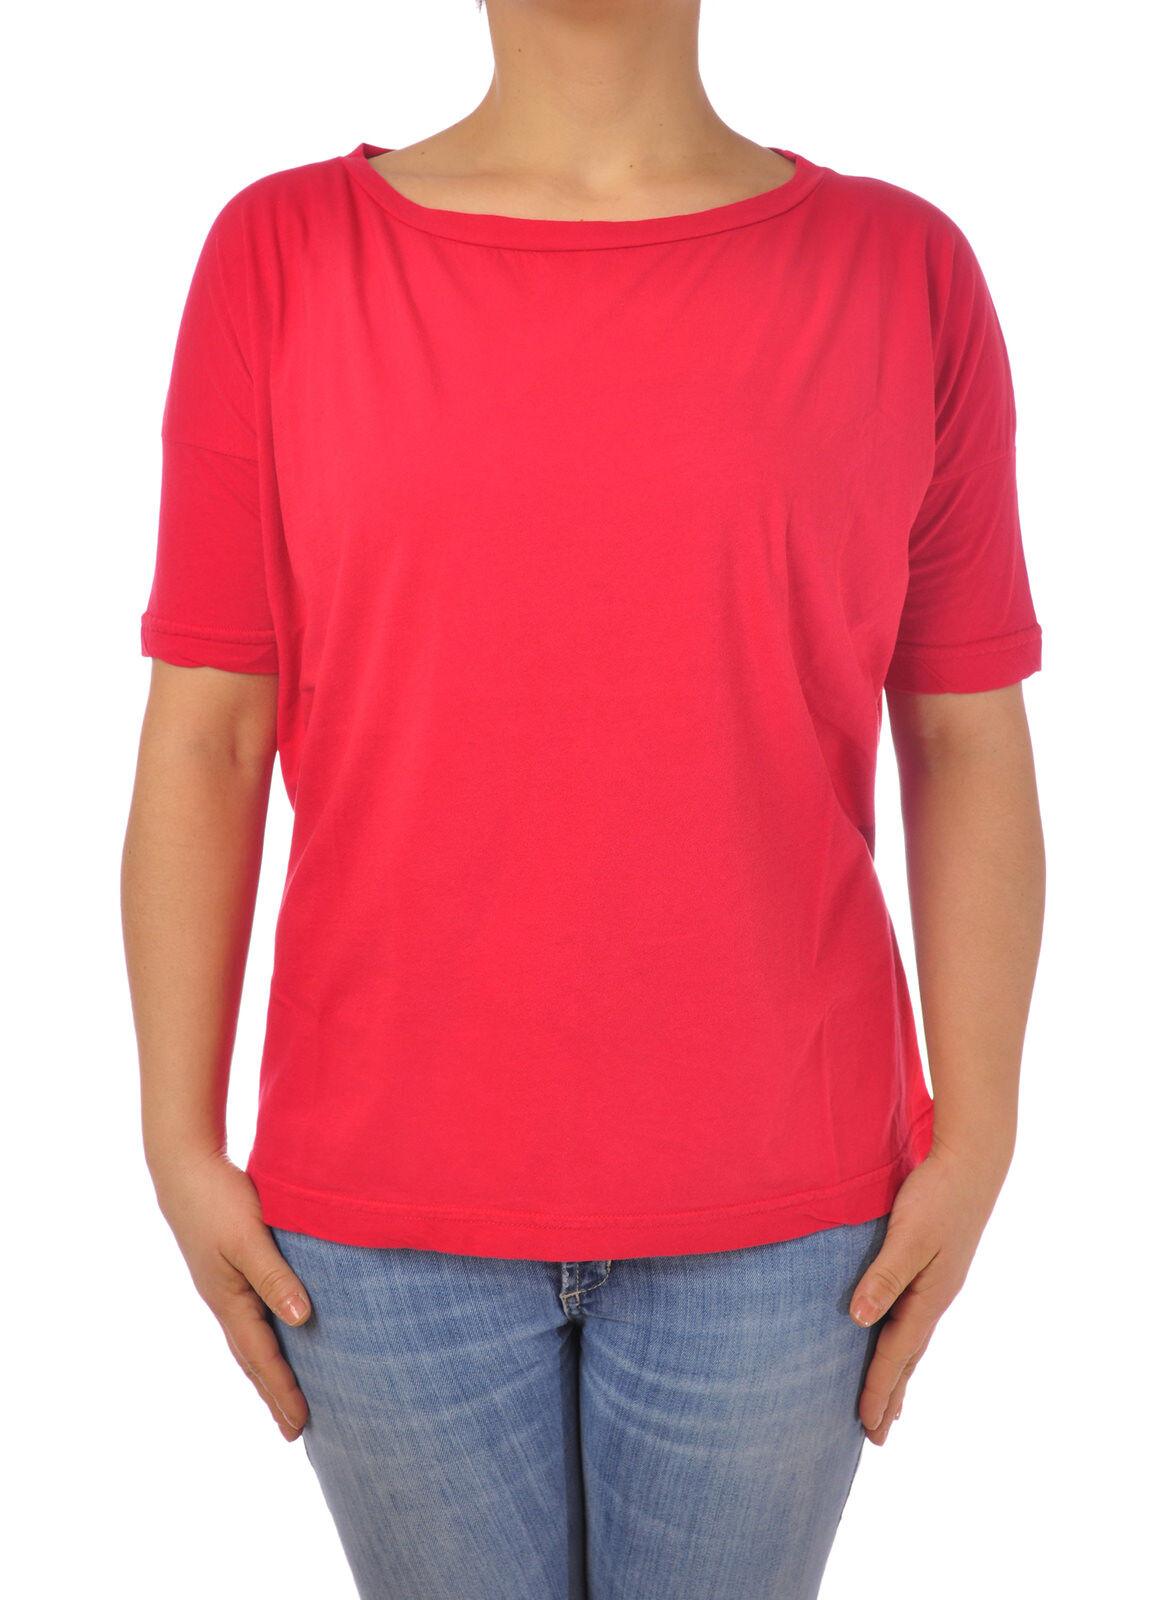 CROSSLEY - Topwear-T-shirts - Woman - Rosa - 5077225E181001